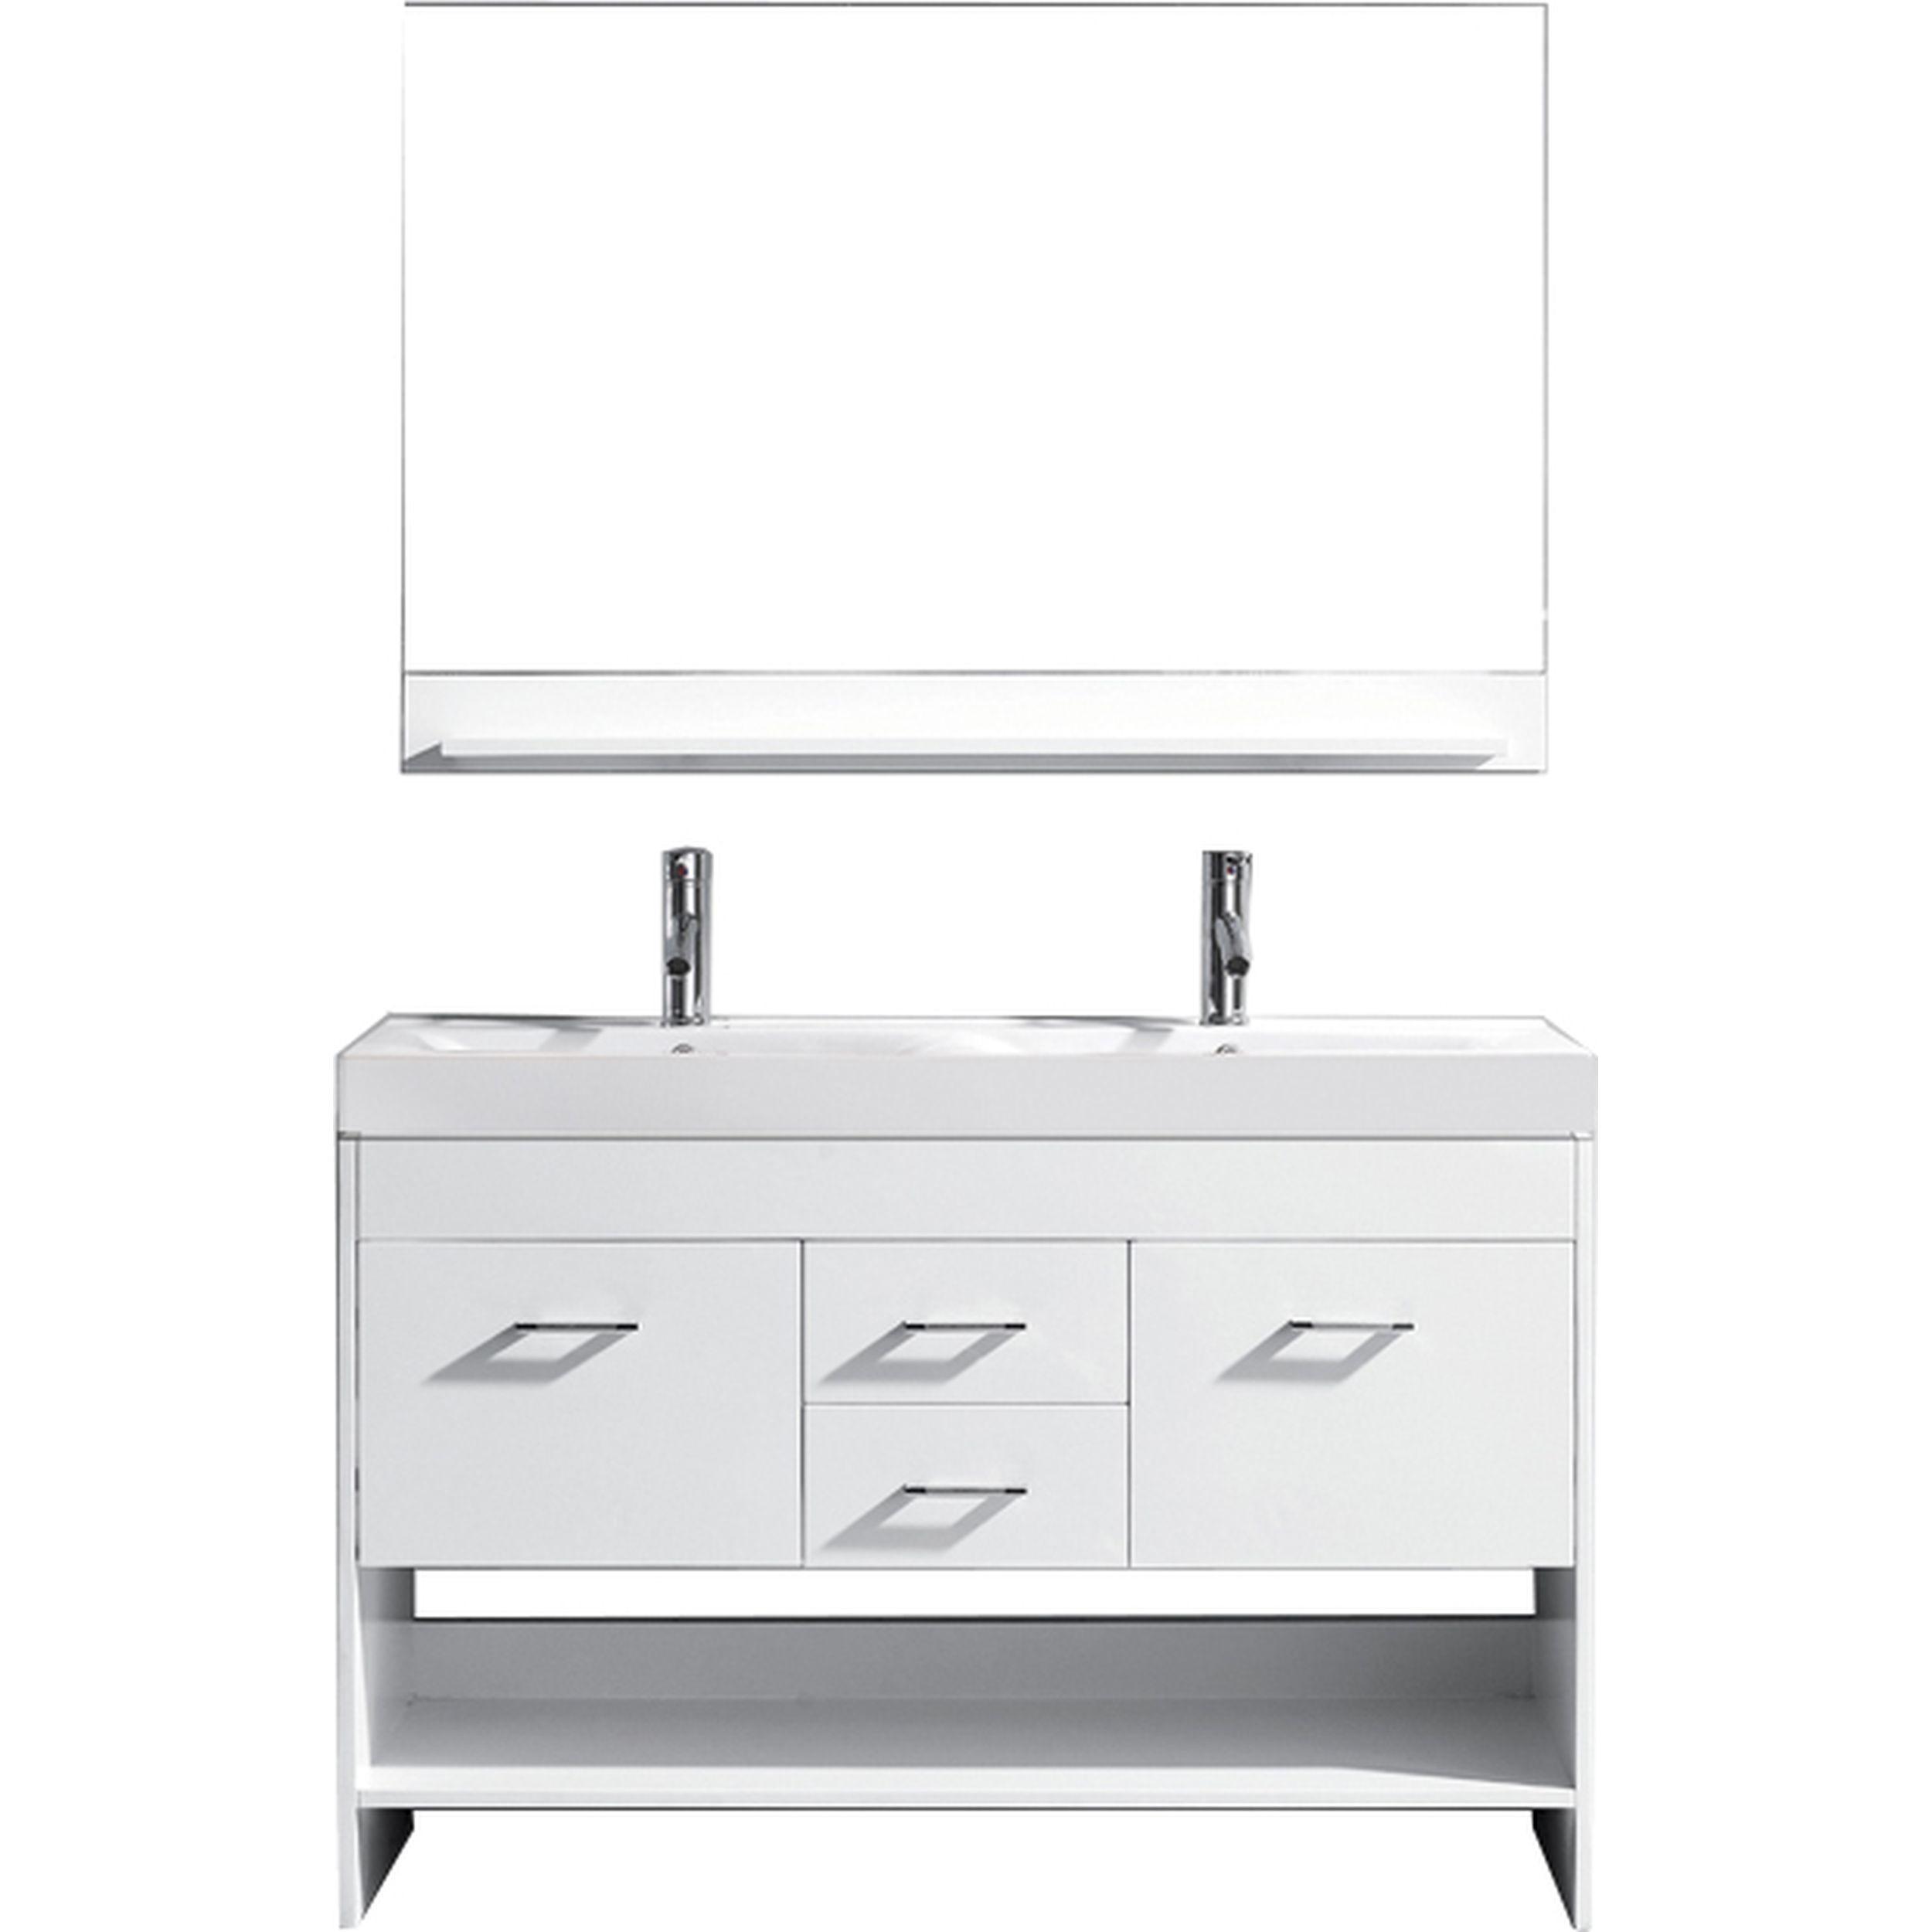 Virtu MD-423-C-WH-001 Gloria 48 Inch Double Bathroom Vanity Set In White